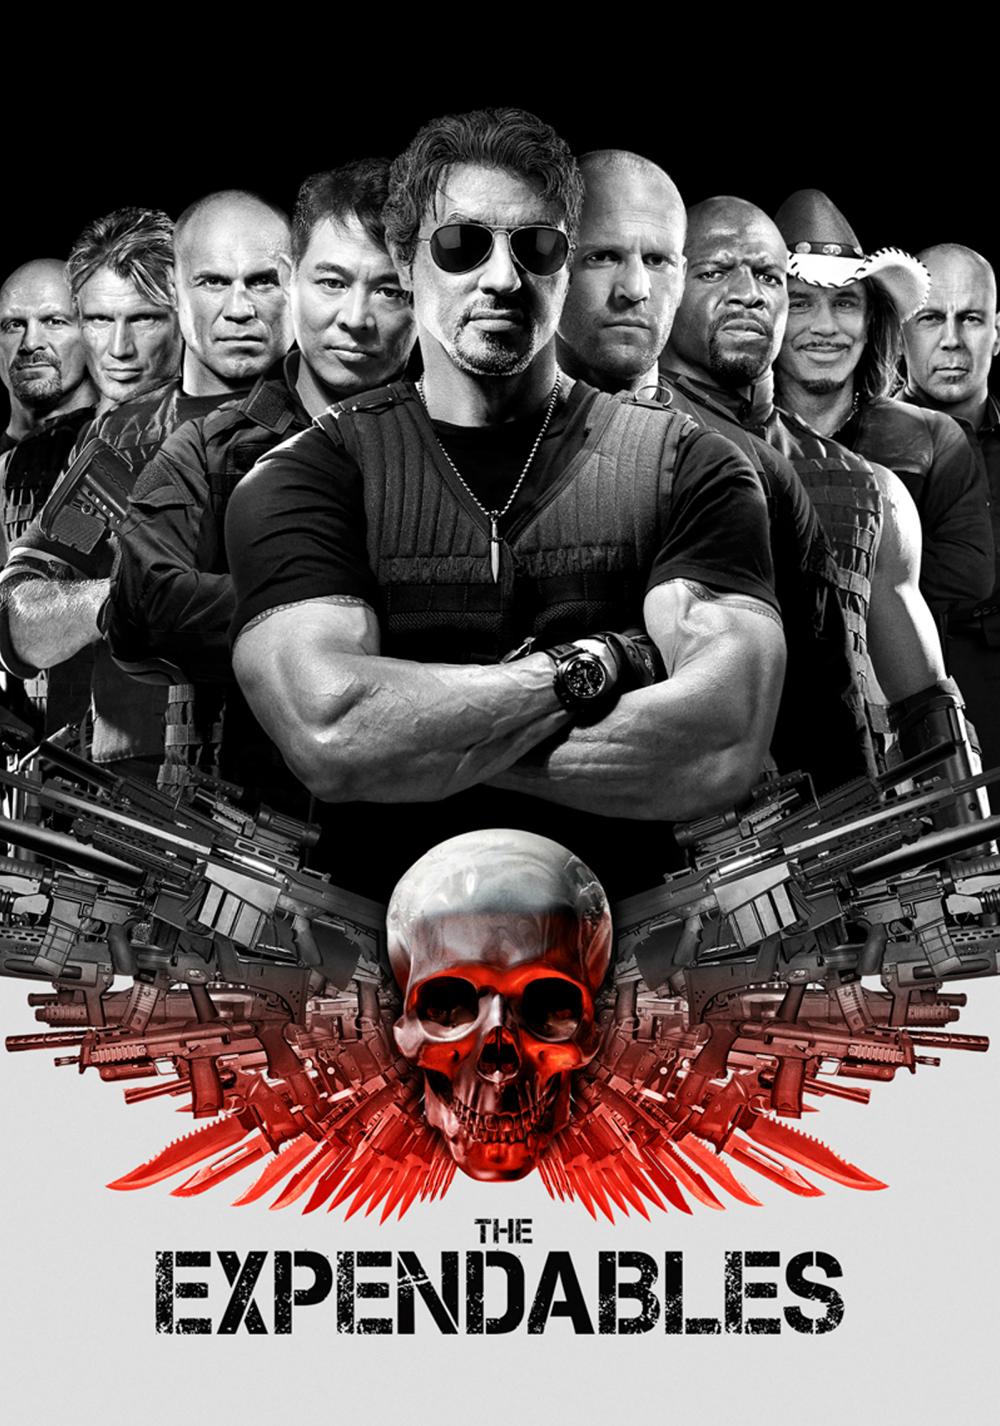 The Expendables : Movie fanart : fanart.tv